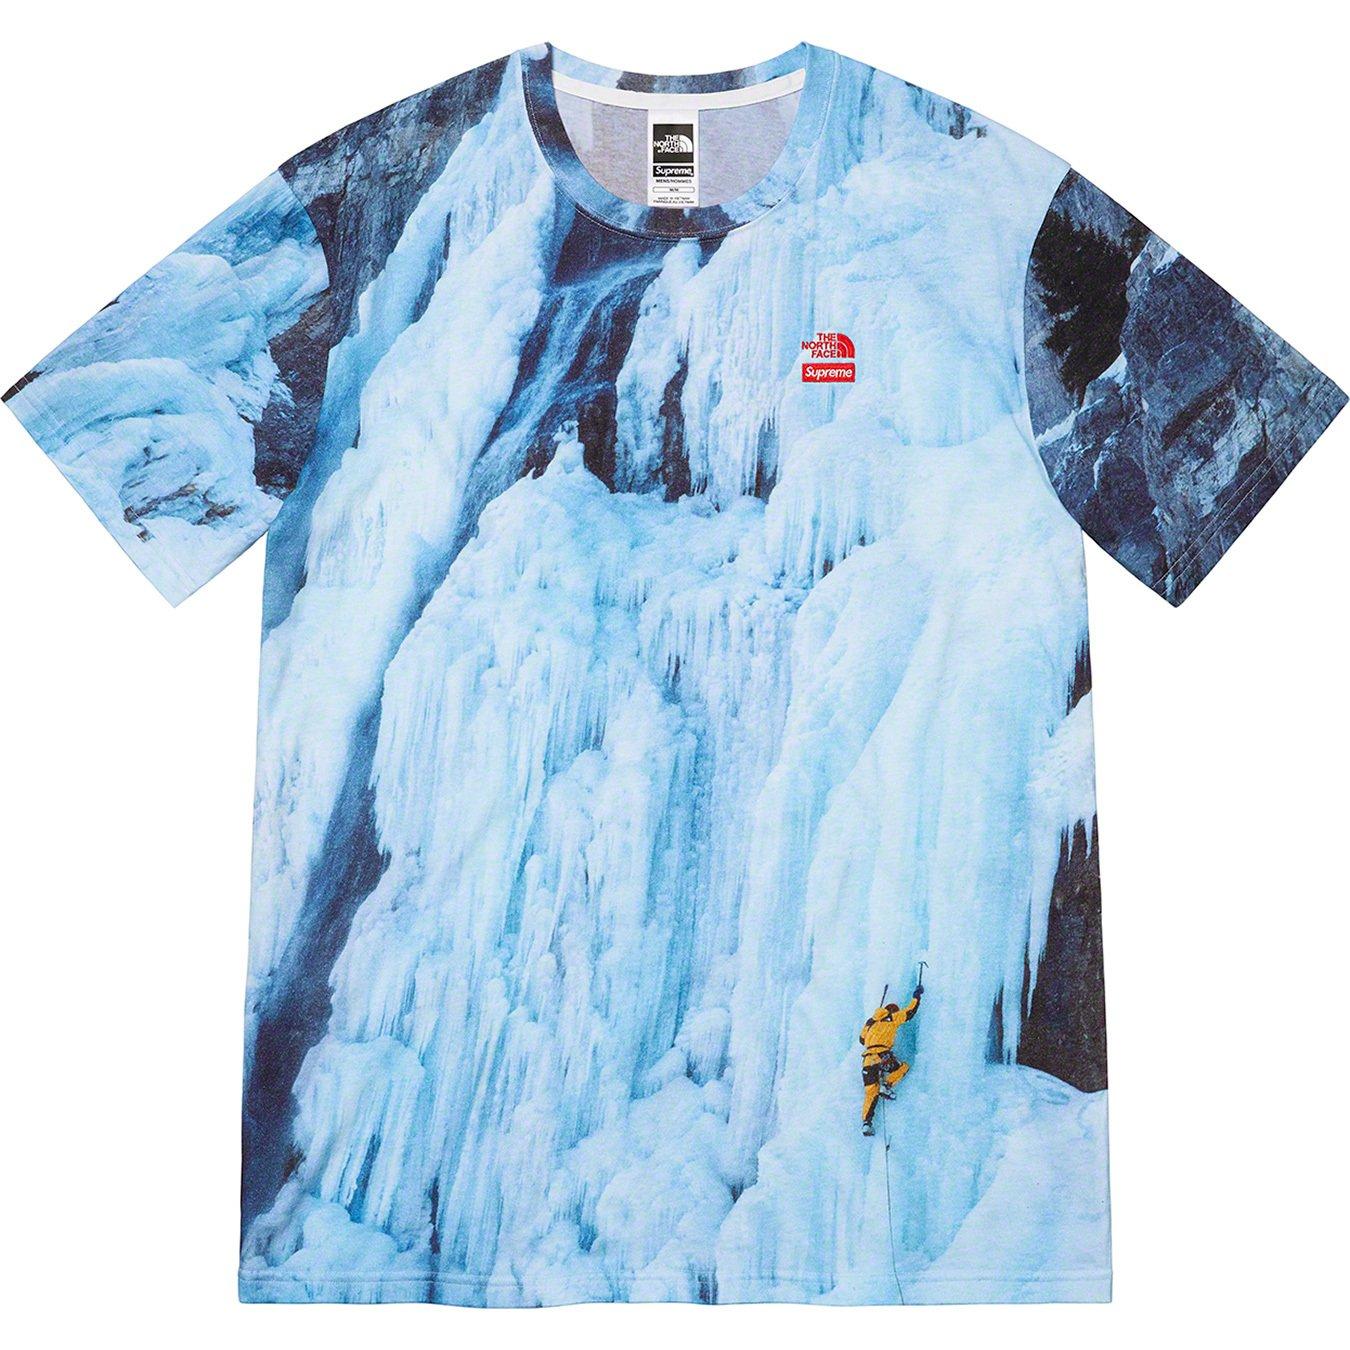 Ice Climb Tee